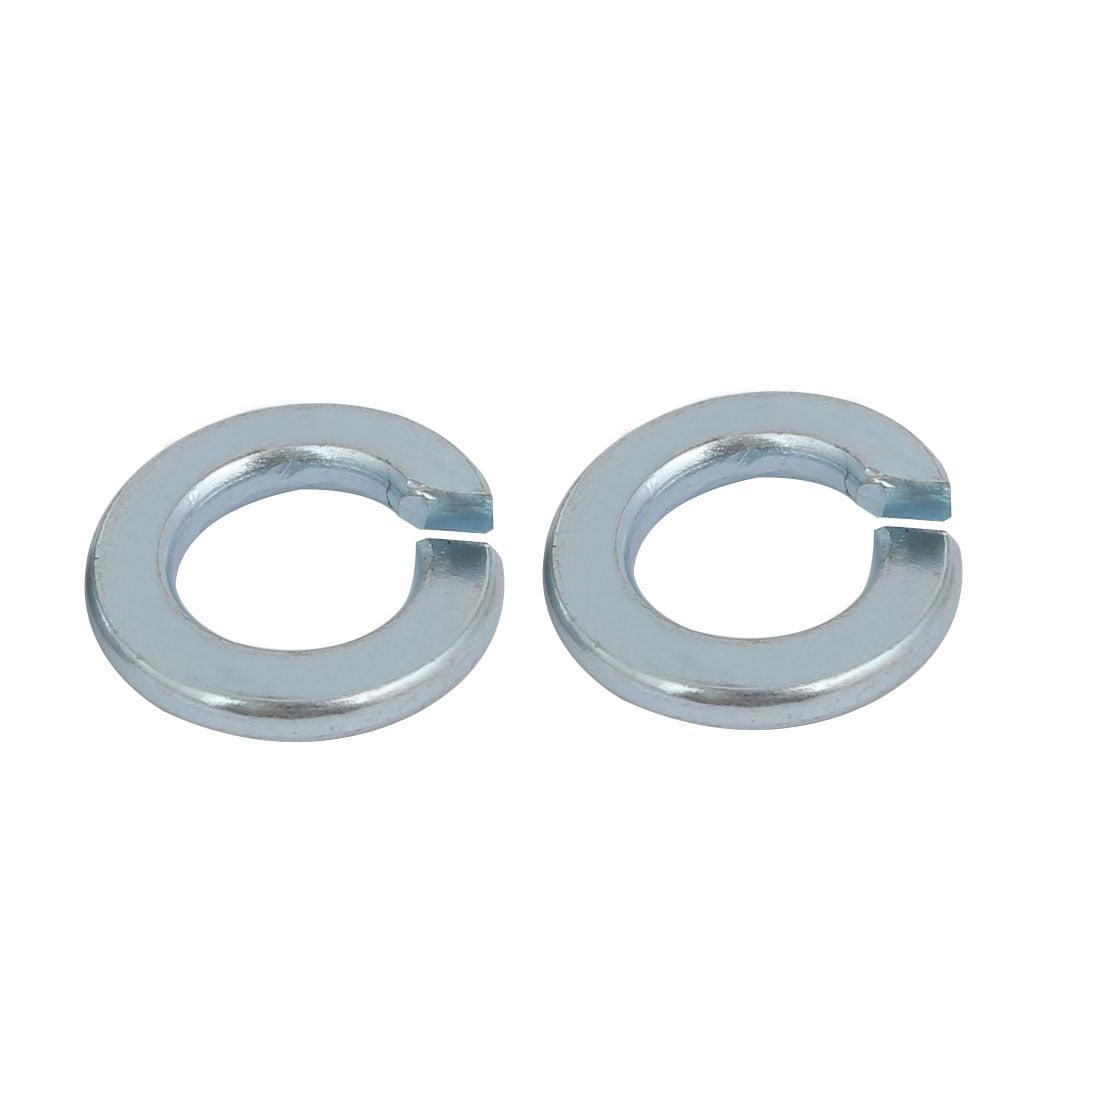 20pcs 3//8-inch Inner Dia Carbon Steel Split Lock Spring Washer Silver Blue